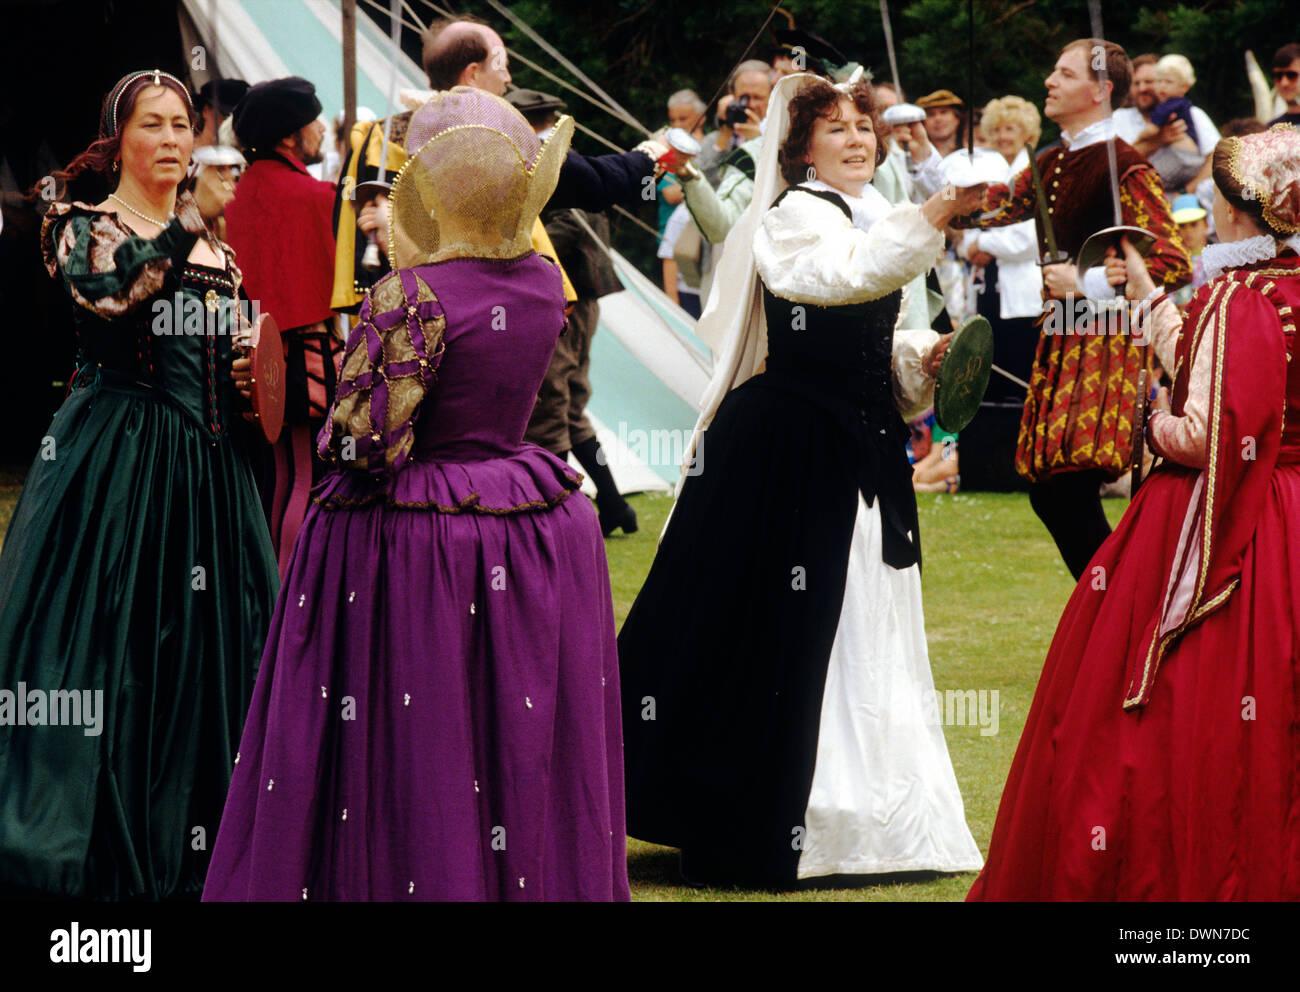 Tudor Periode tanzen, Ende des 16. Jahrhunderts Reenactment, Männer Frauen tanzen elisabethanischen Tanzkostüm Stockbild